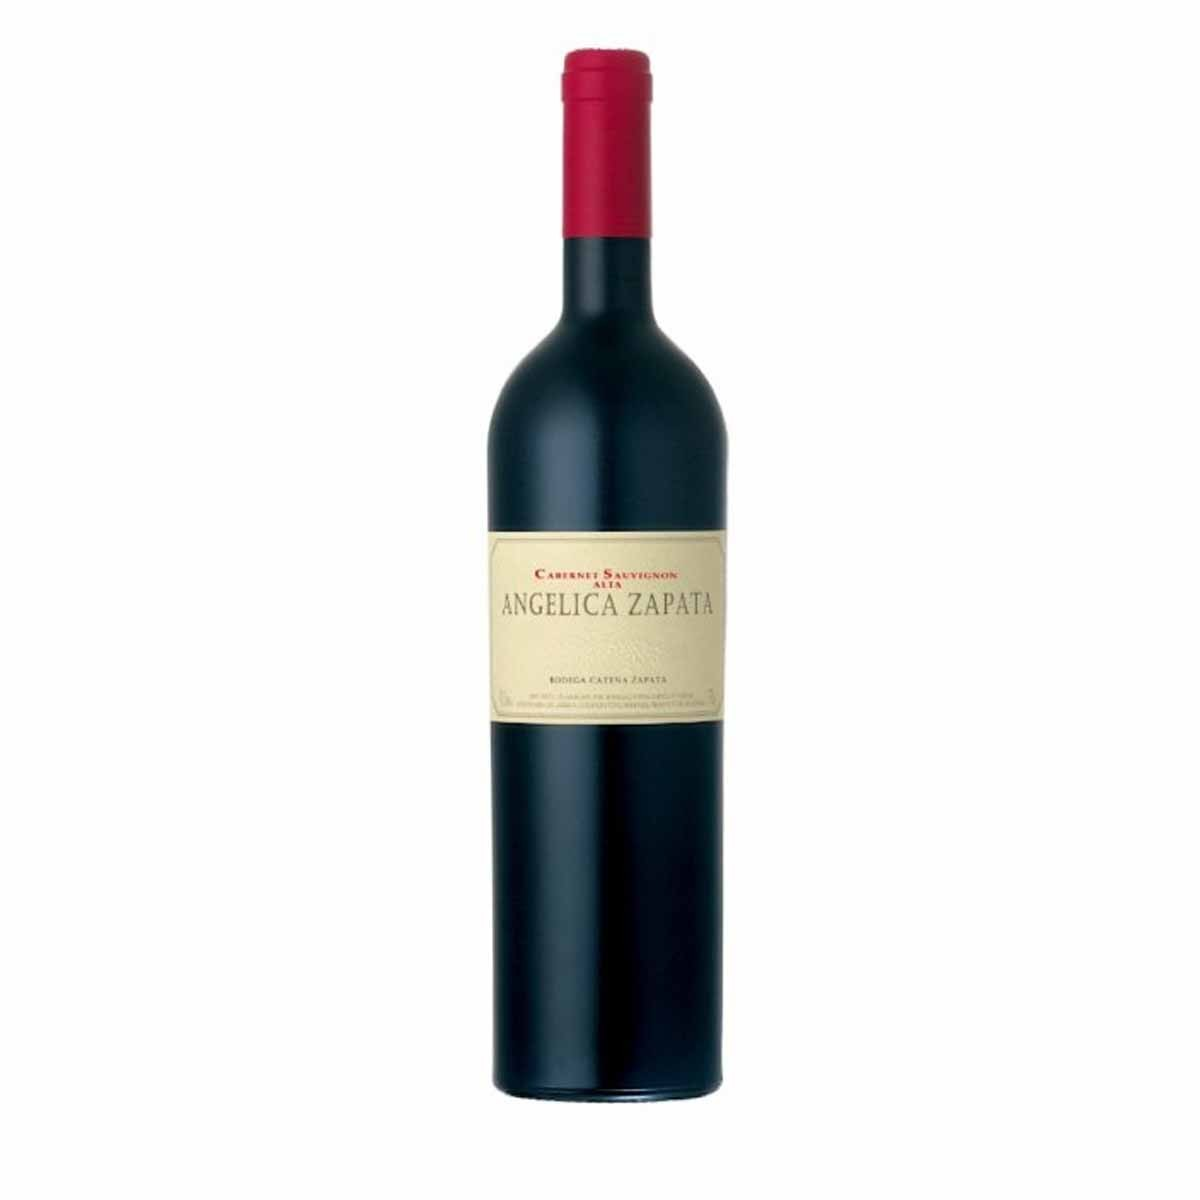 Vinho Tinto Argentino Angelica Zapata Cabernet Sauvignon 15